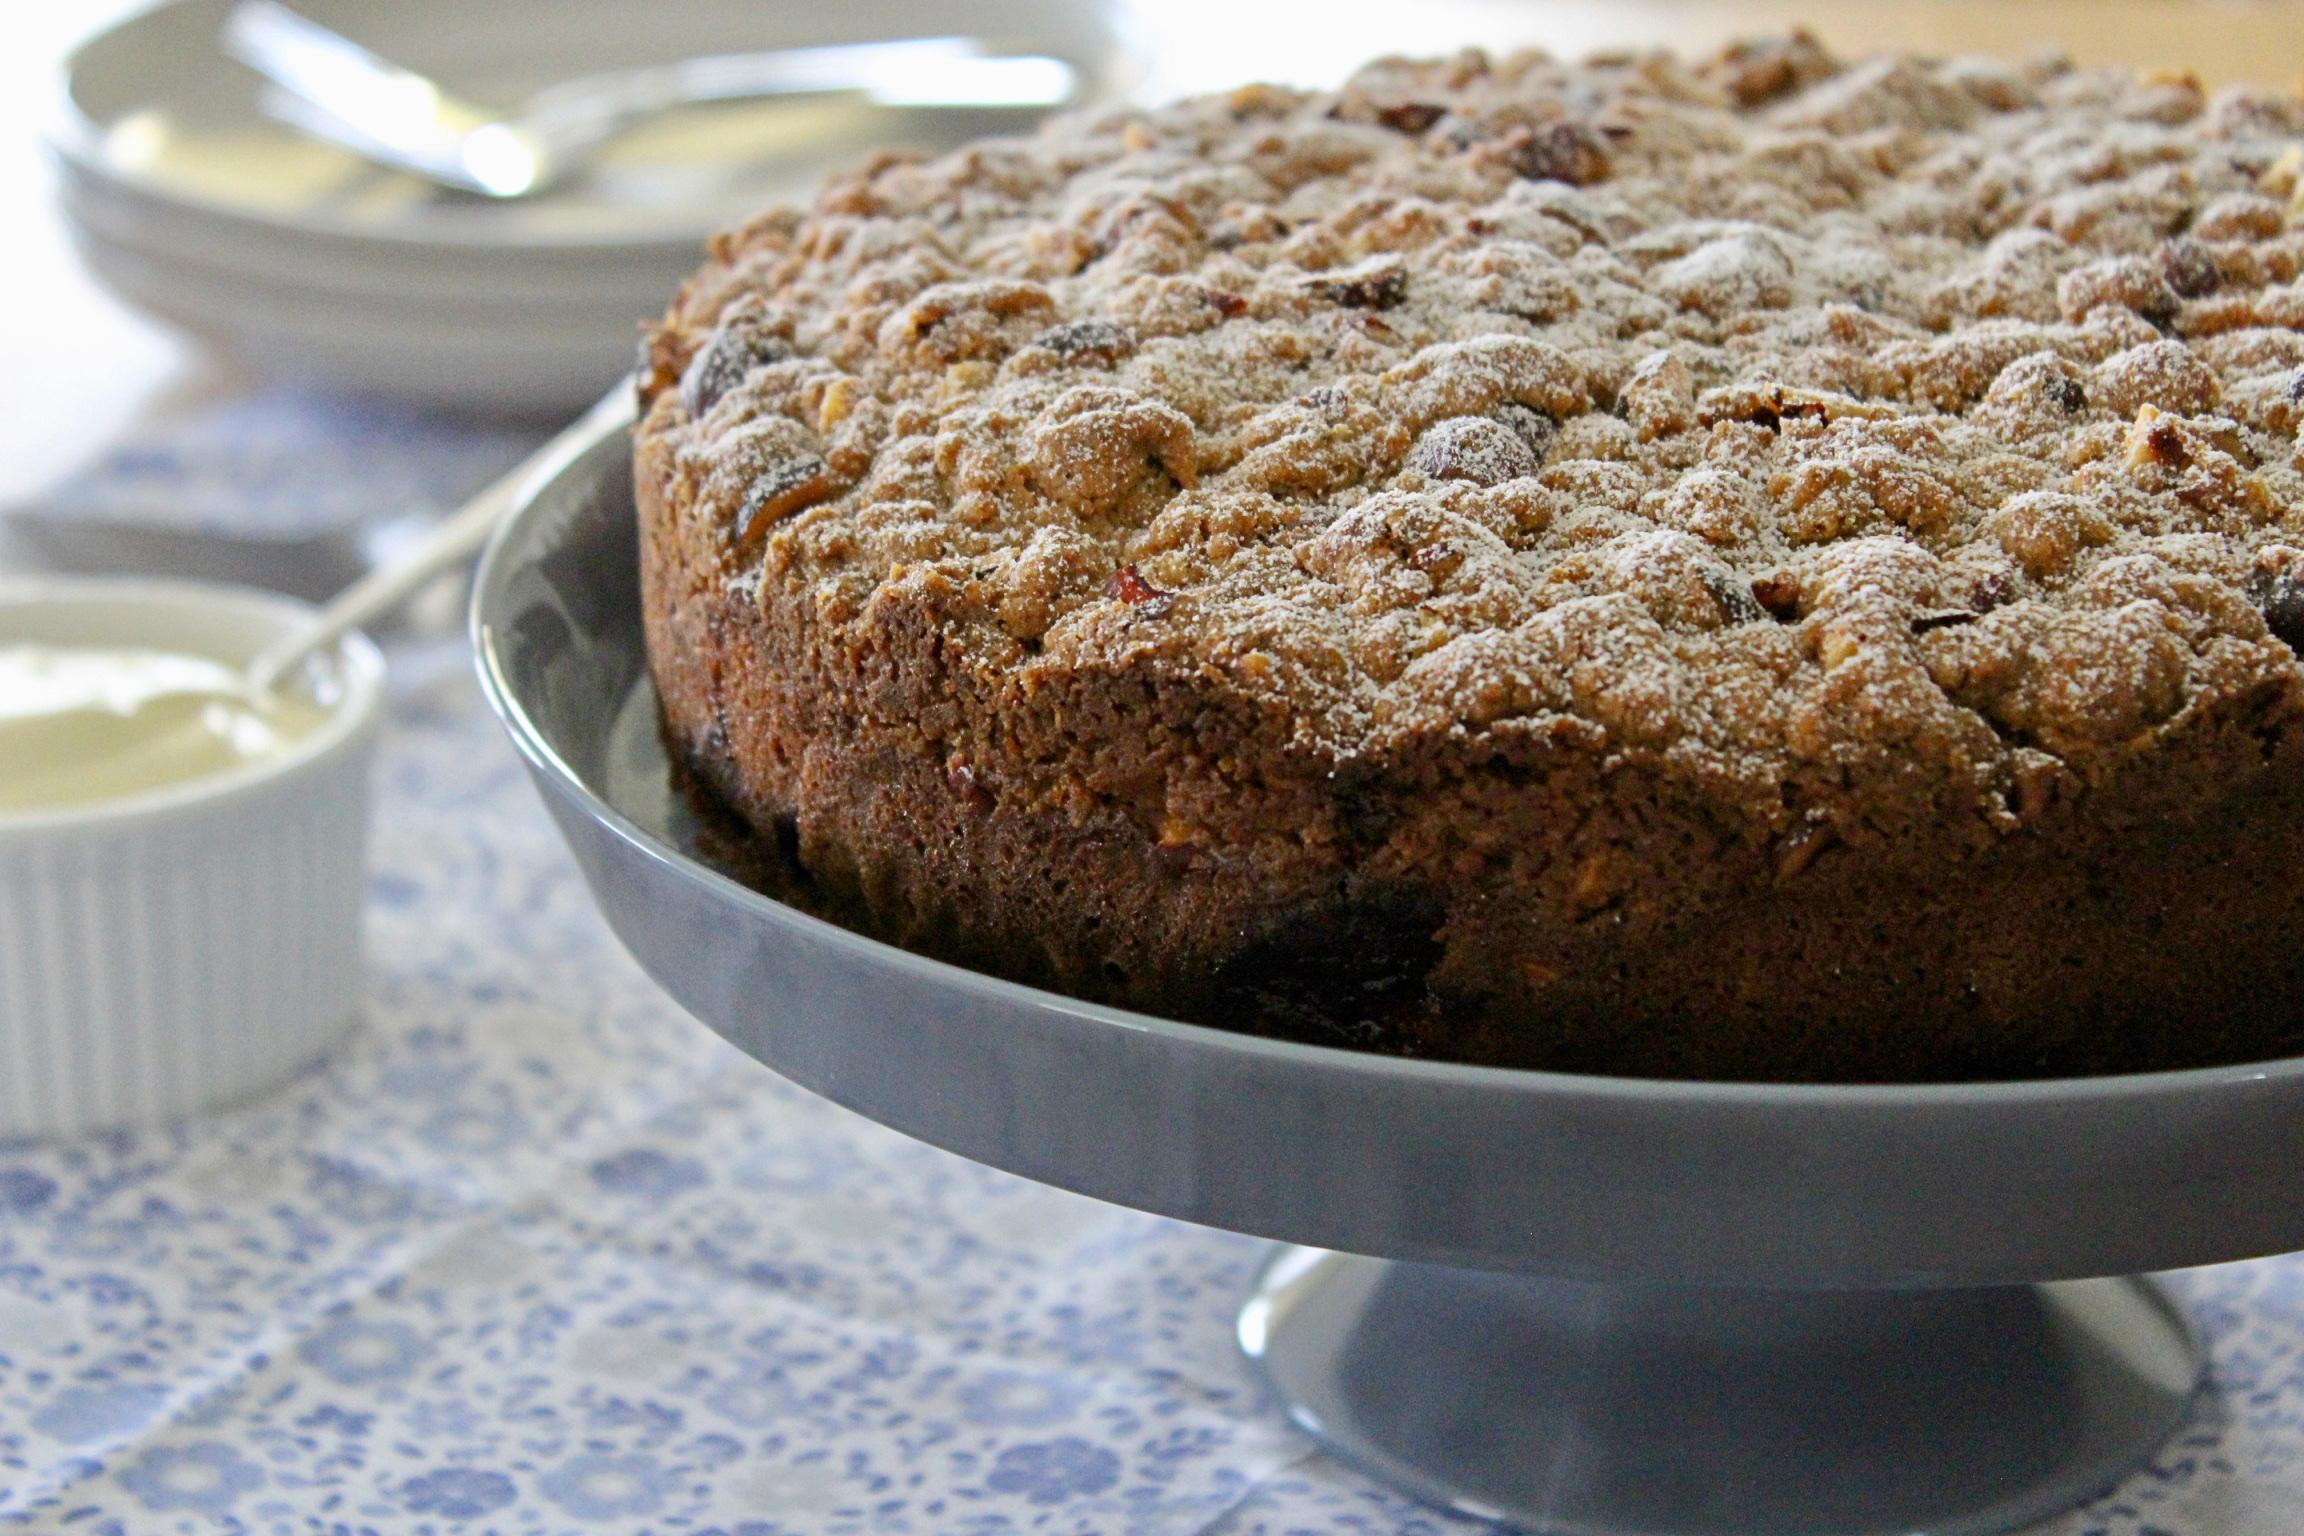 Apple Sour Cream Cake with Hazelnut Crumble 1.jpg